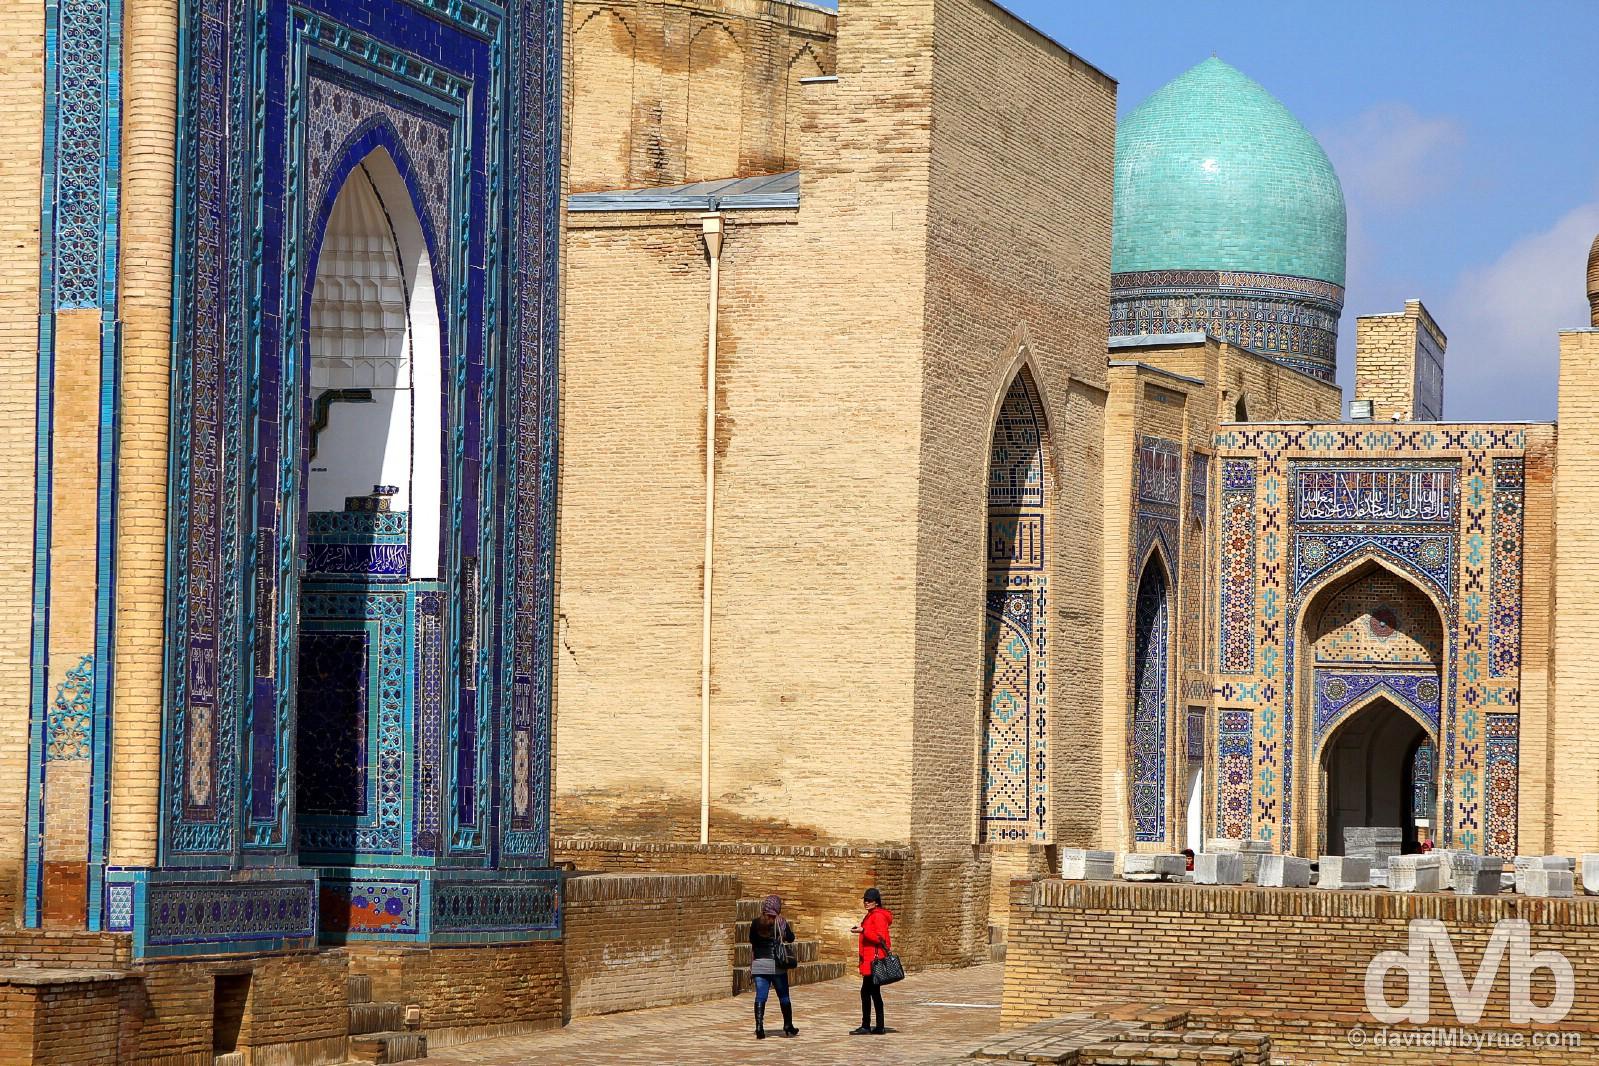 Shah-i-Zinda, the Avenue of Mausoleums, in Samarkand, Uzbekistan. March 8, 2015.